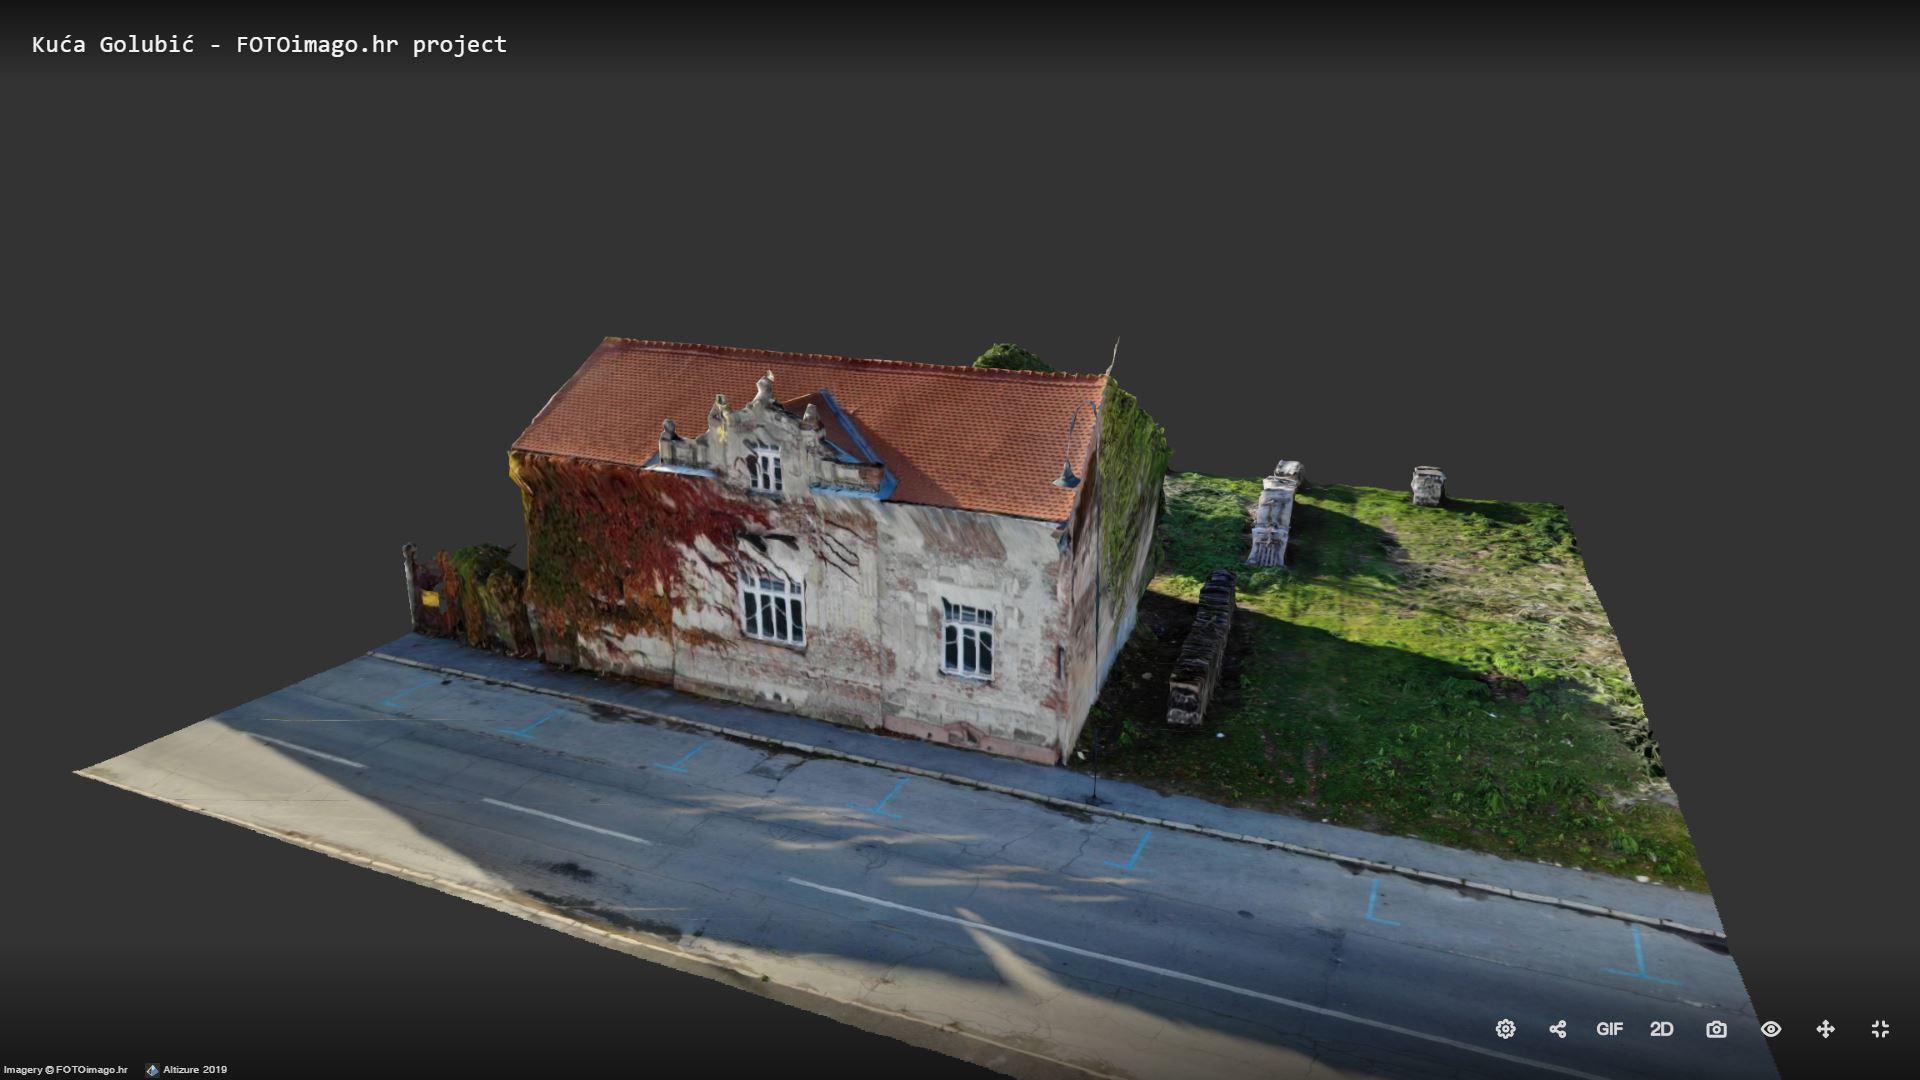 Kuća Golubić